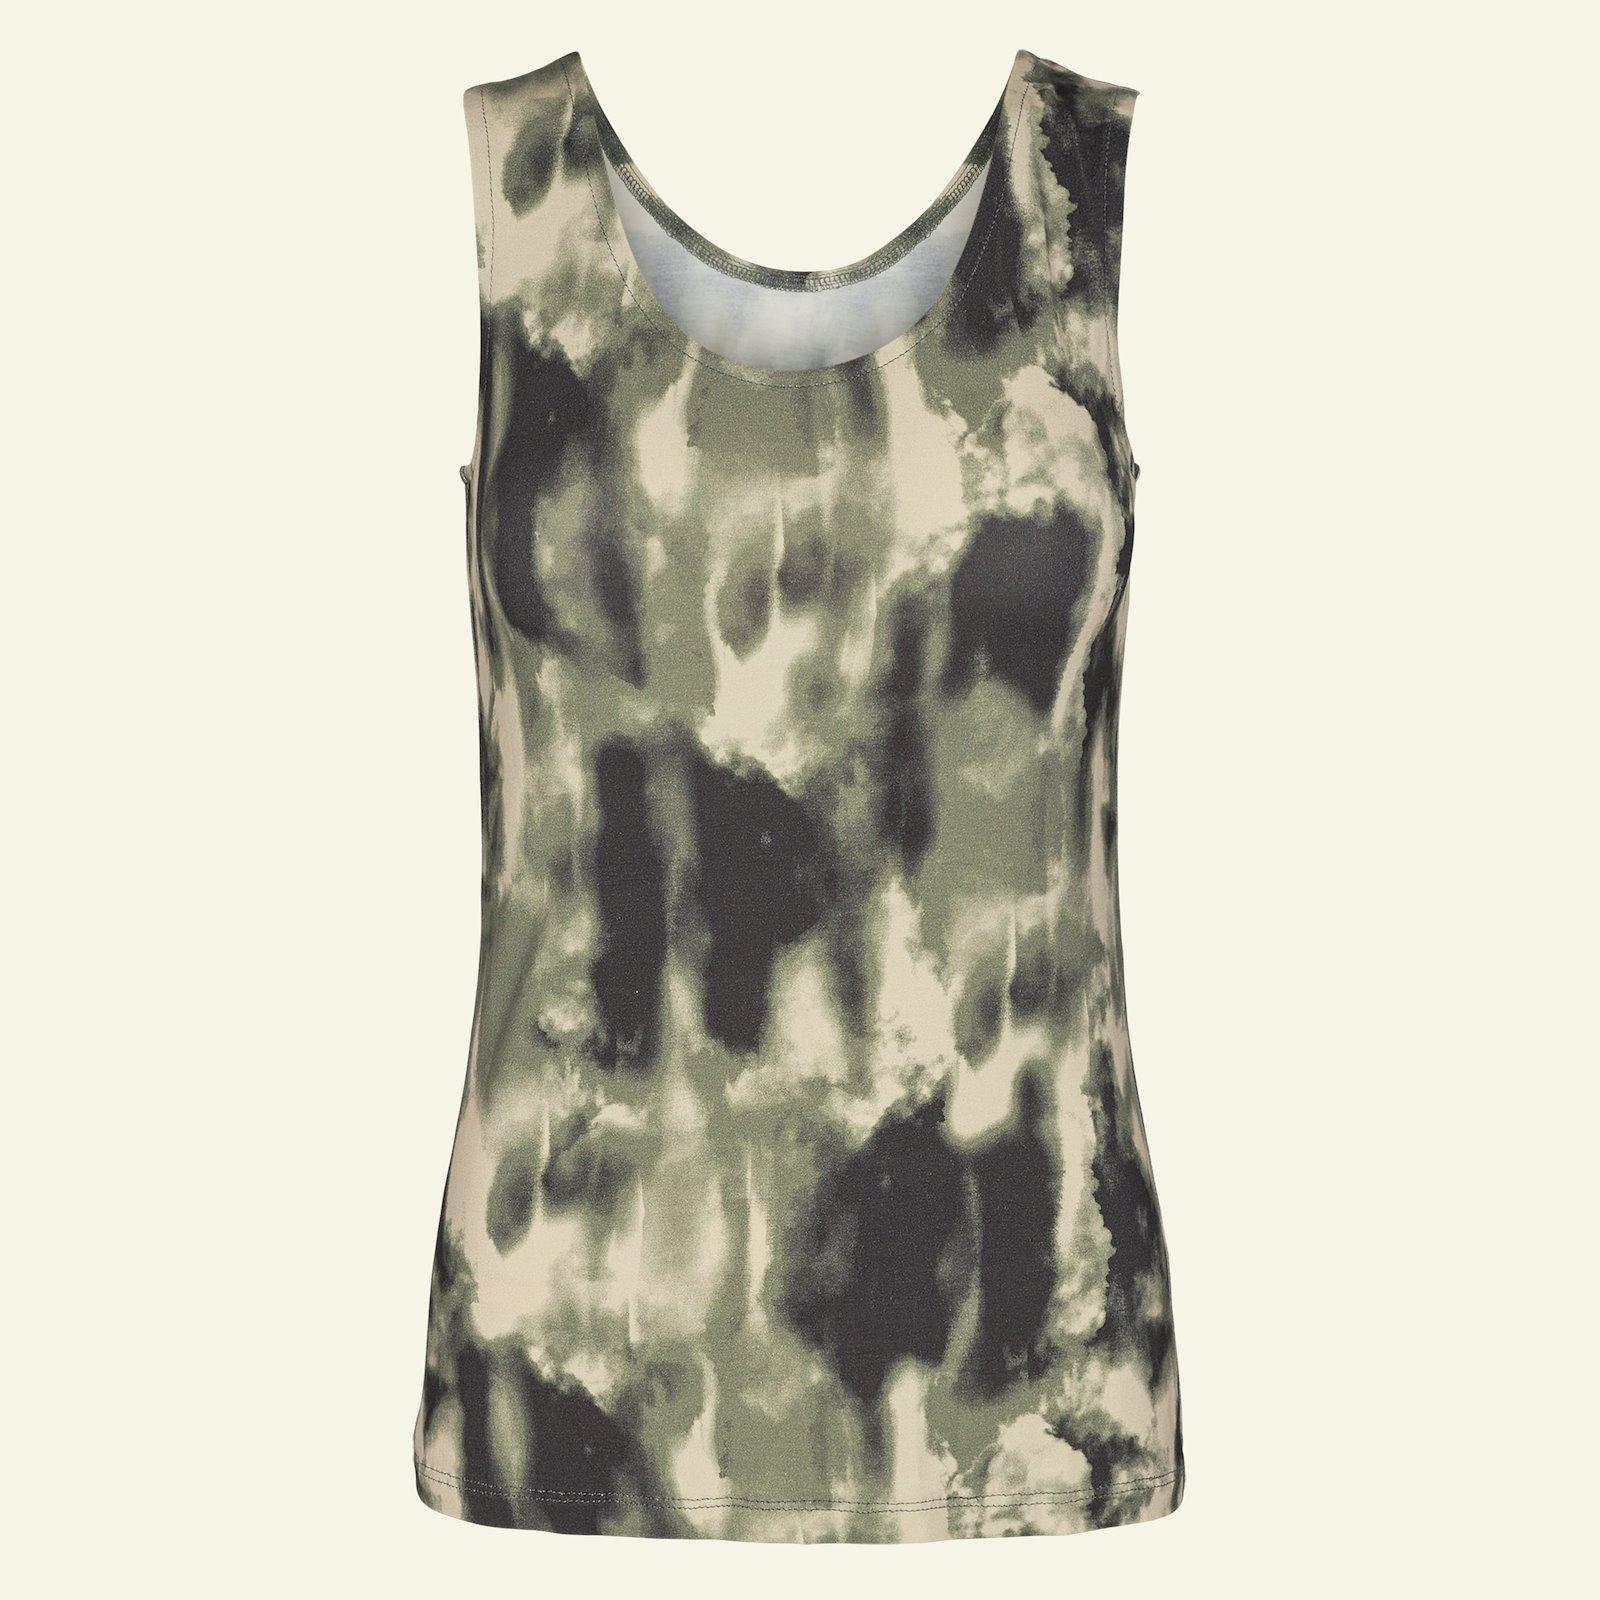 Top and dress, 36/8 p22071_272691_sskit